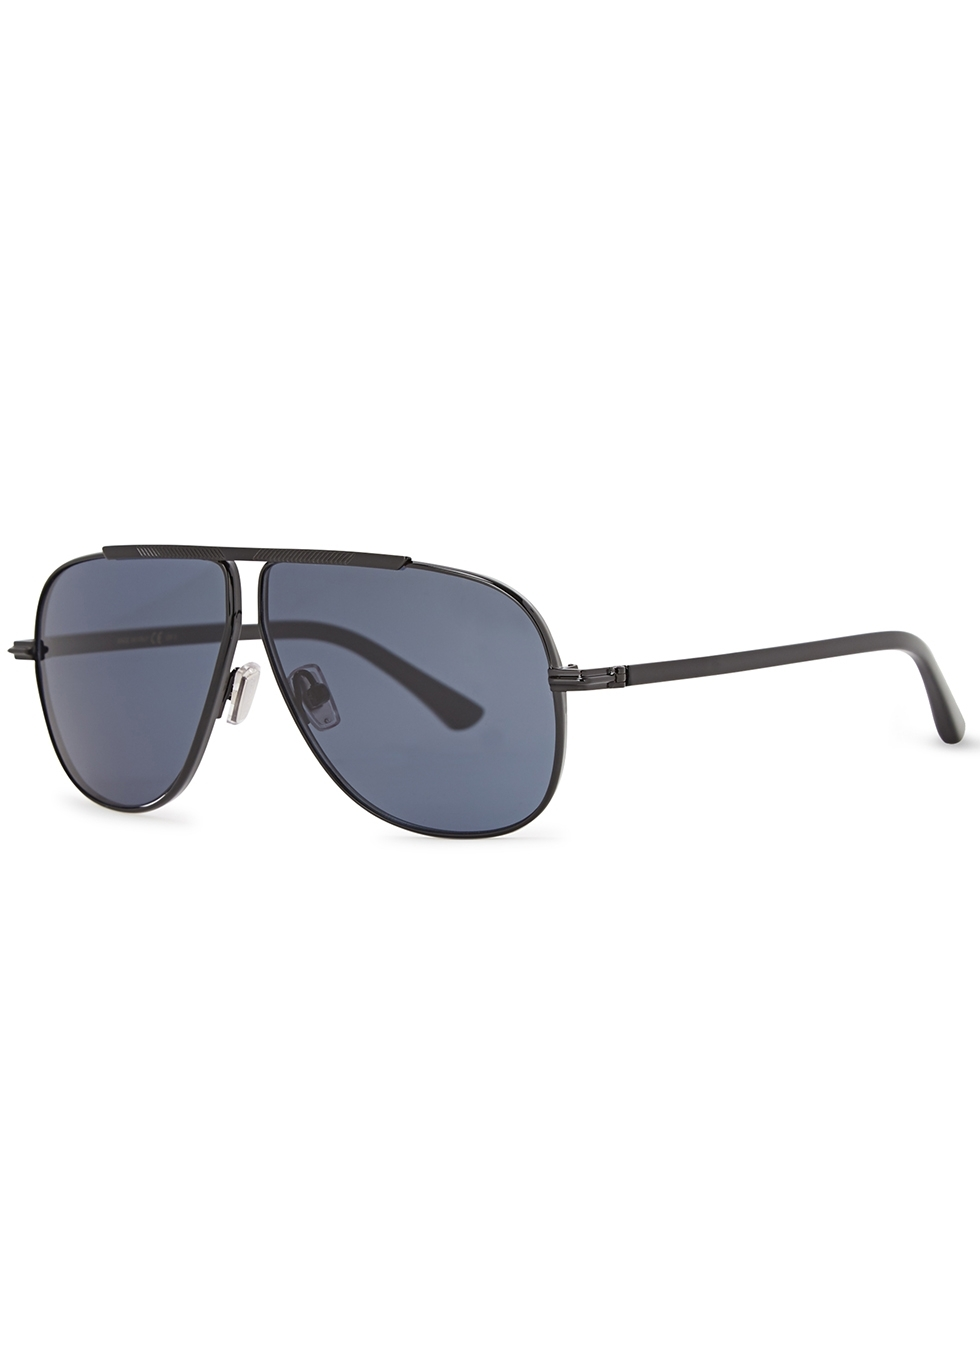 d0aeb70a92 Women s Designer Sunglasses and Eyewear - Harvey Nichols